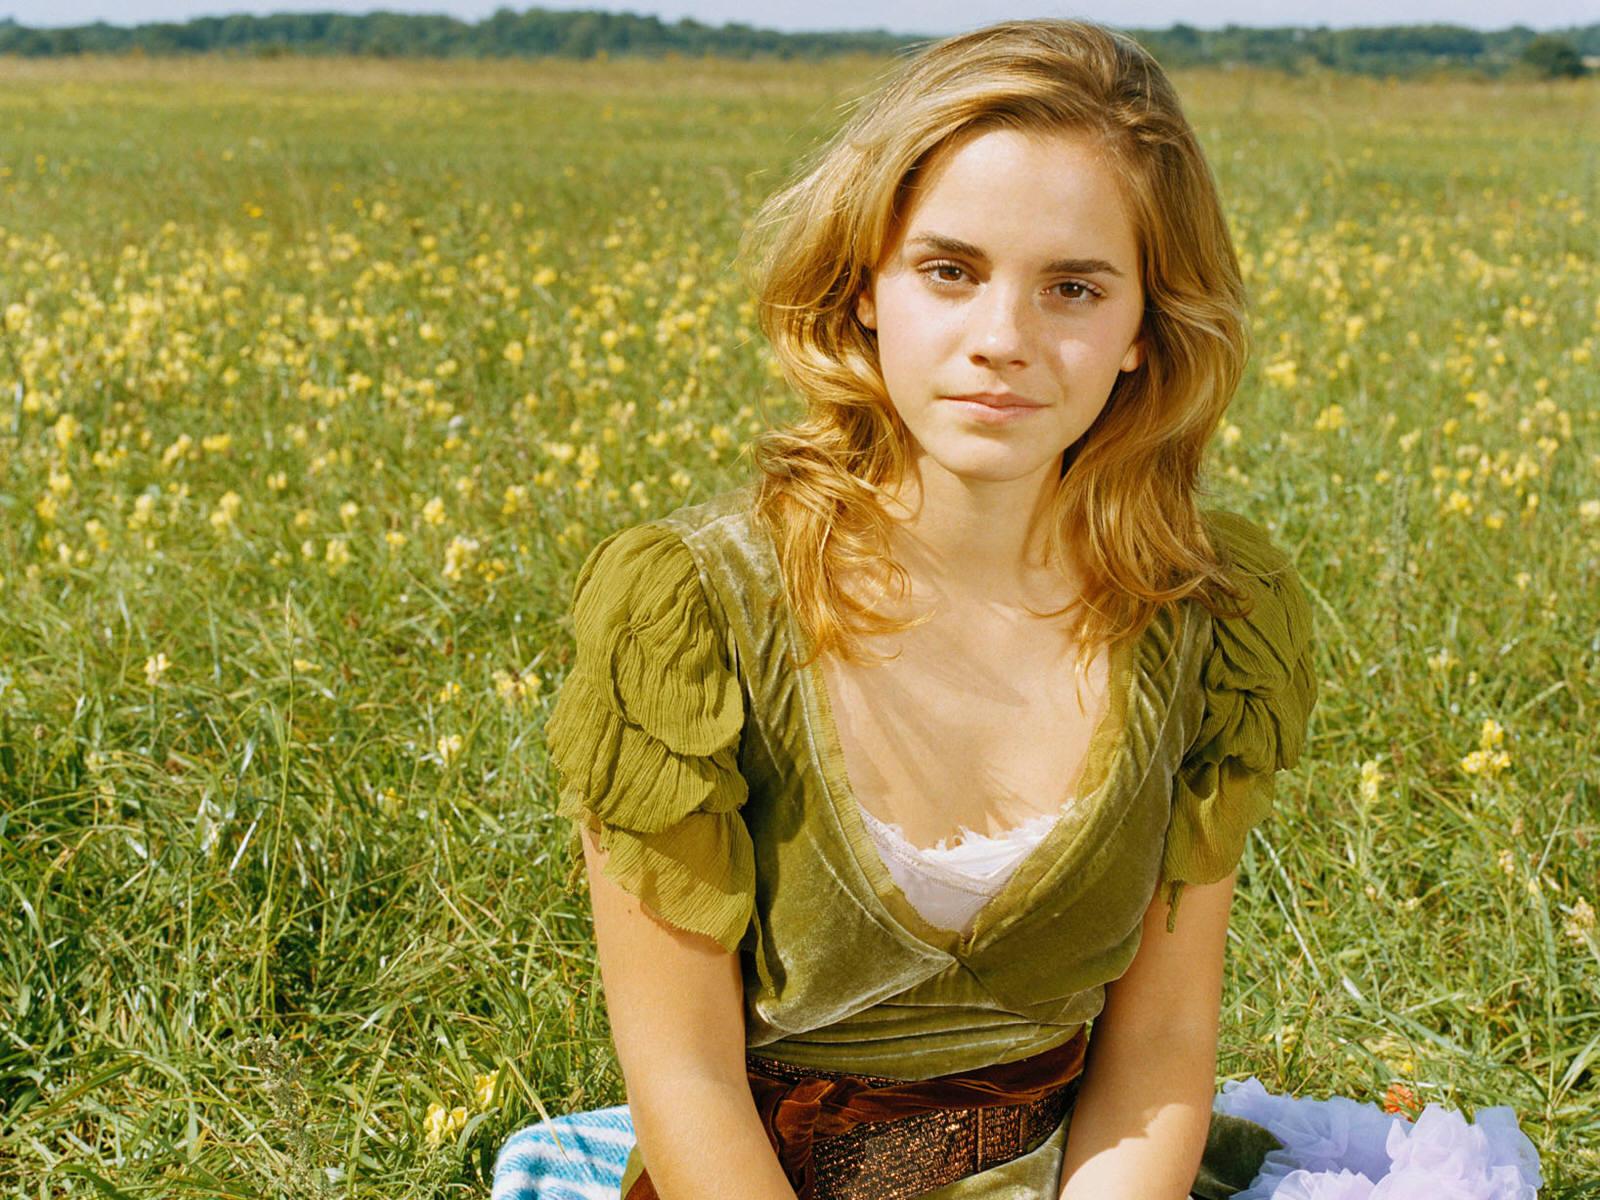 Google themes emma watson -  Hollywood Actress Emma Watson Wallpapers Collections Part 1